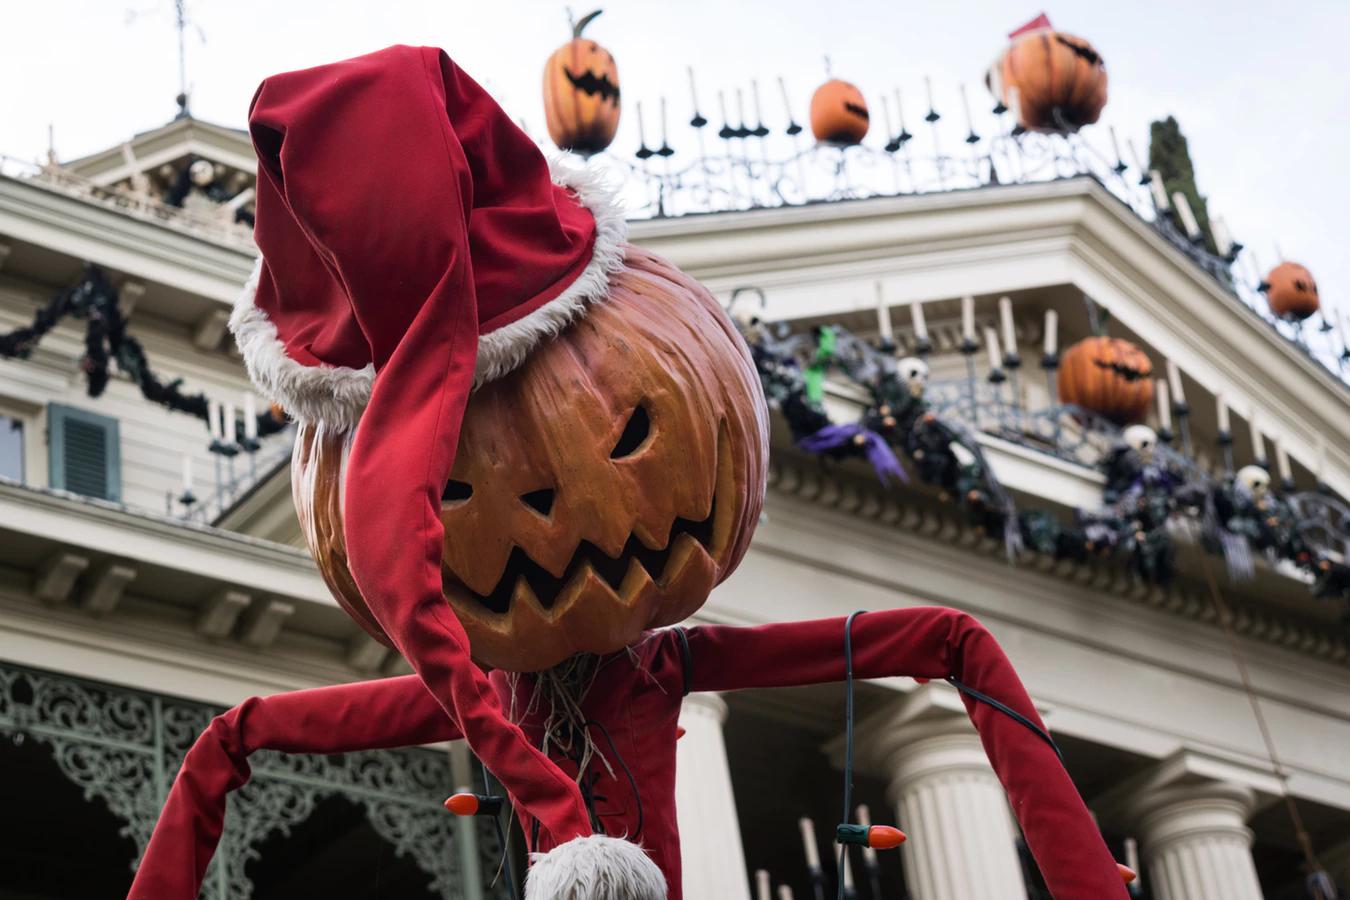 Pumpkin decor inspired by Tim Burton's The Nightmare Before Christmas at Disneyland Resort in Anaheim